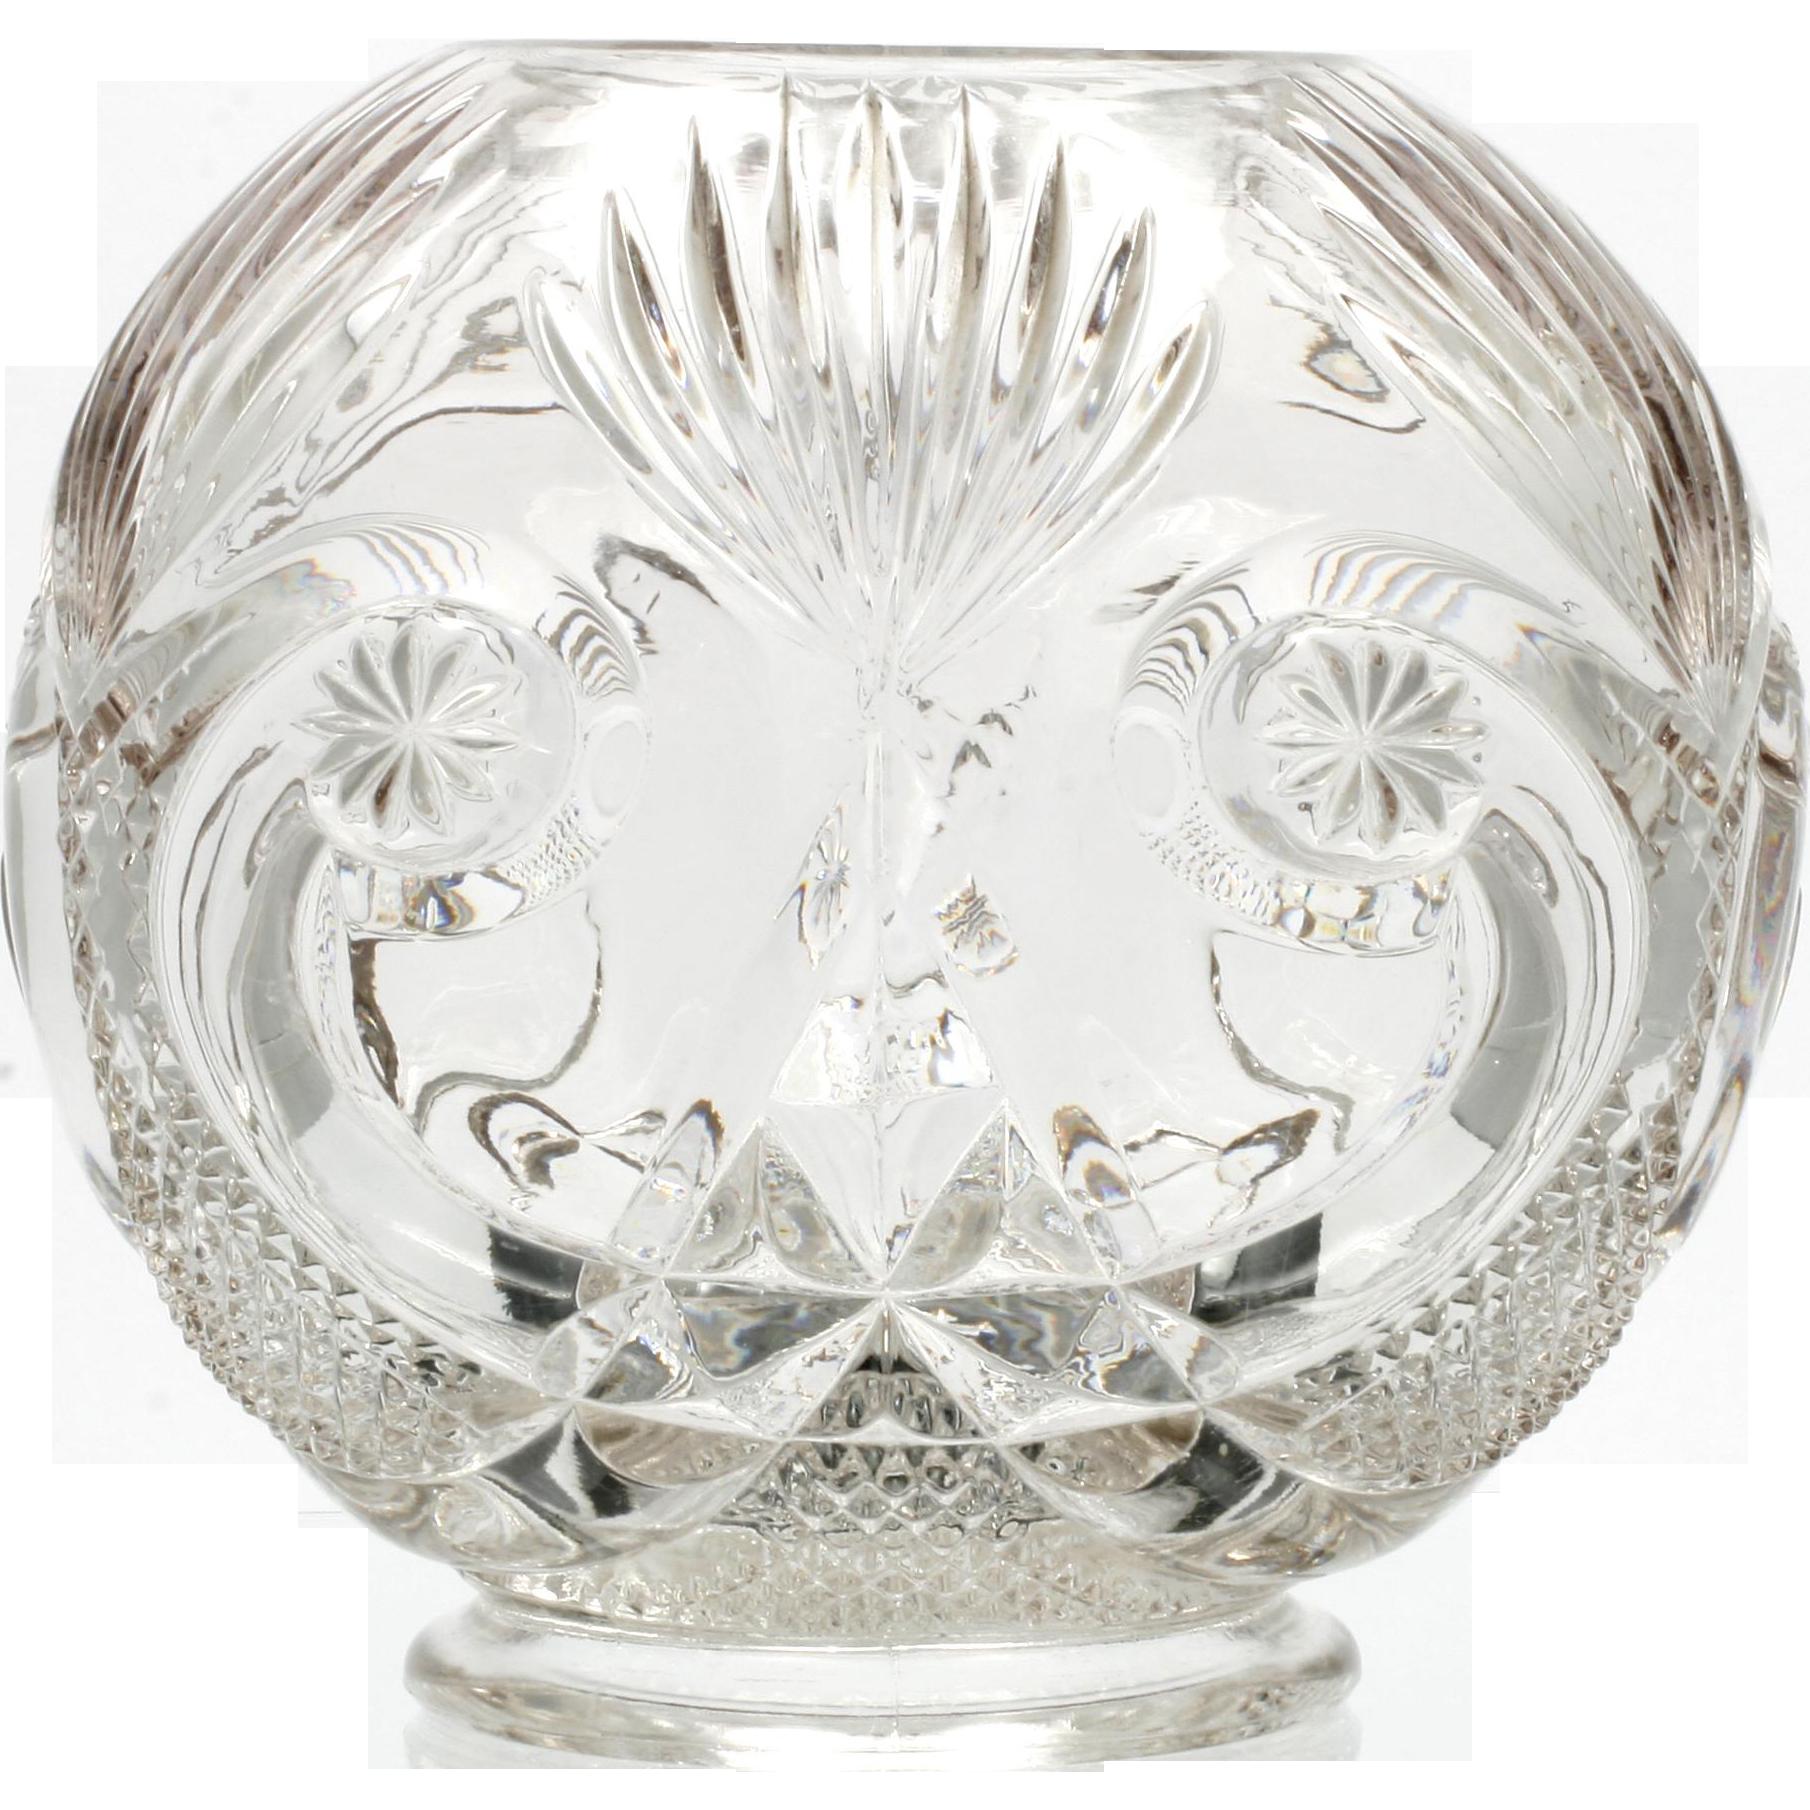 EAPG Starred Scroll Rose Bowl Antique Pressed Glass Large Vase